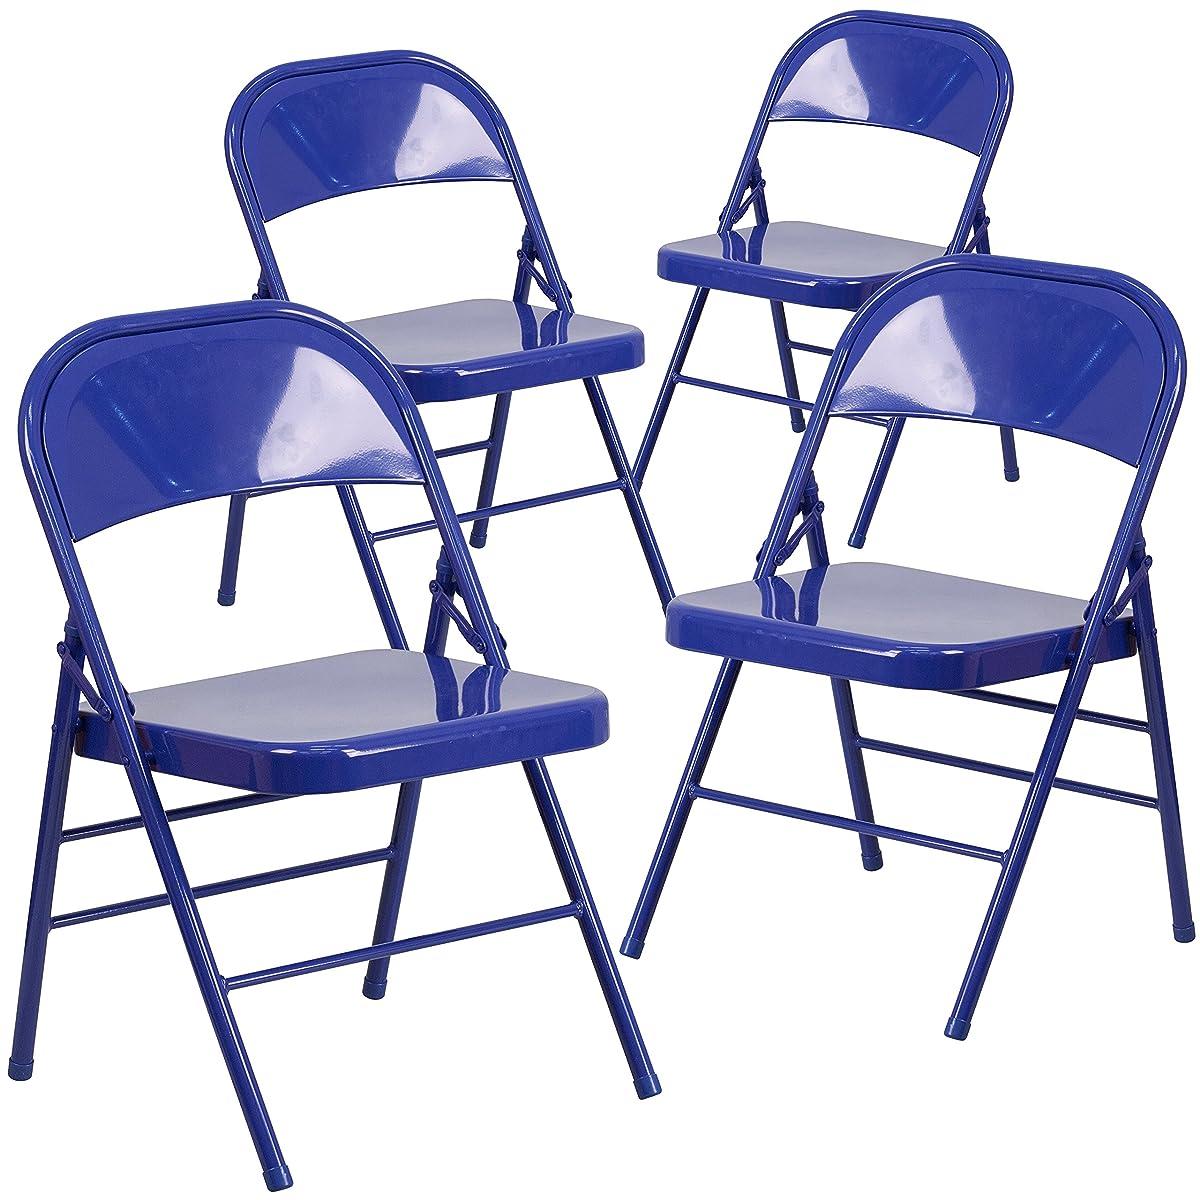 Flash Furniture 4 Pk. HERCULES COLORBURST Series Cobalt Blue Triple Braced & Double Hinged Metal Folding Chair